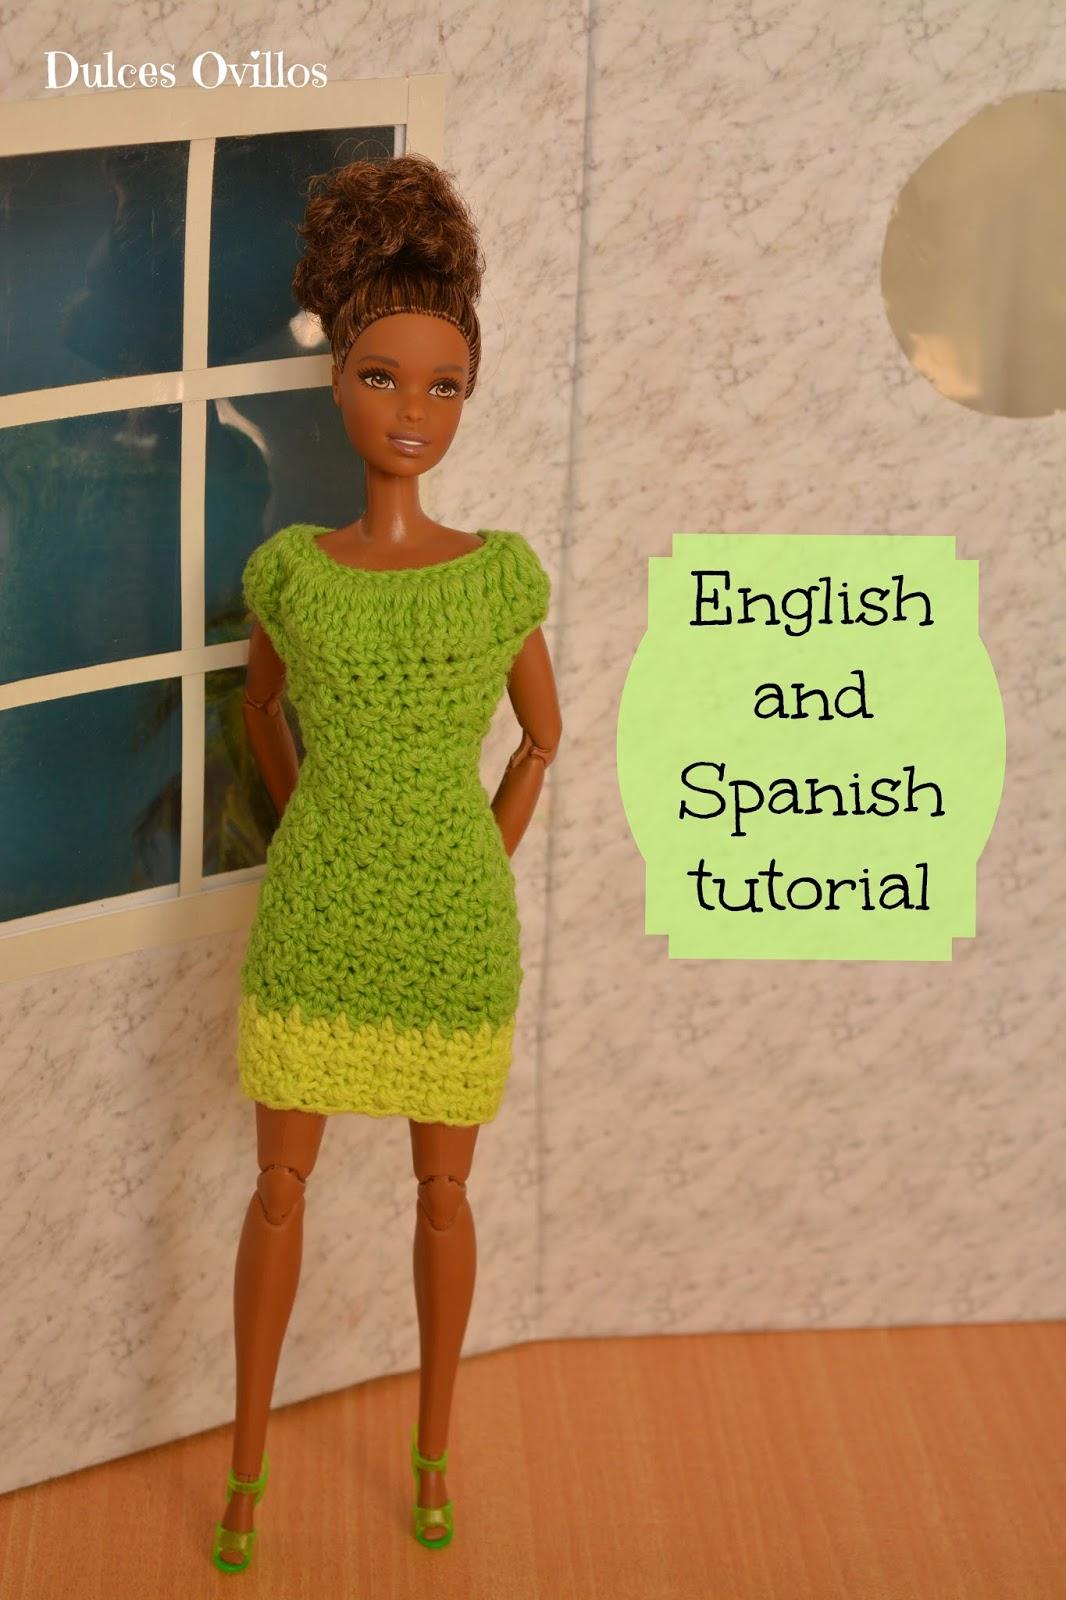 Dulces ovillos vestido a crochet para barbie crochet - Tuto dressing ...